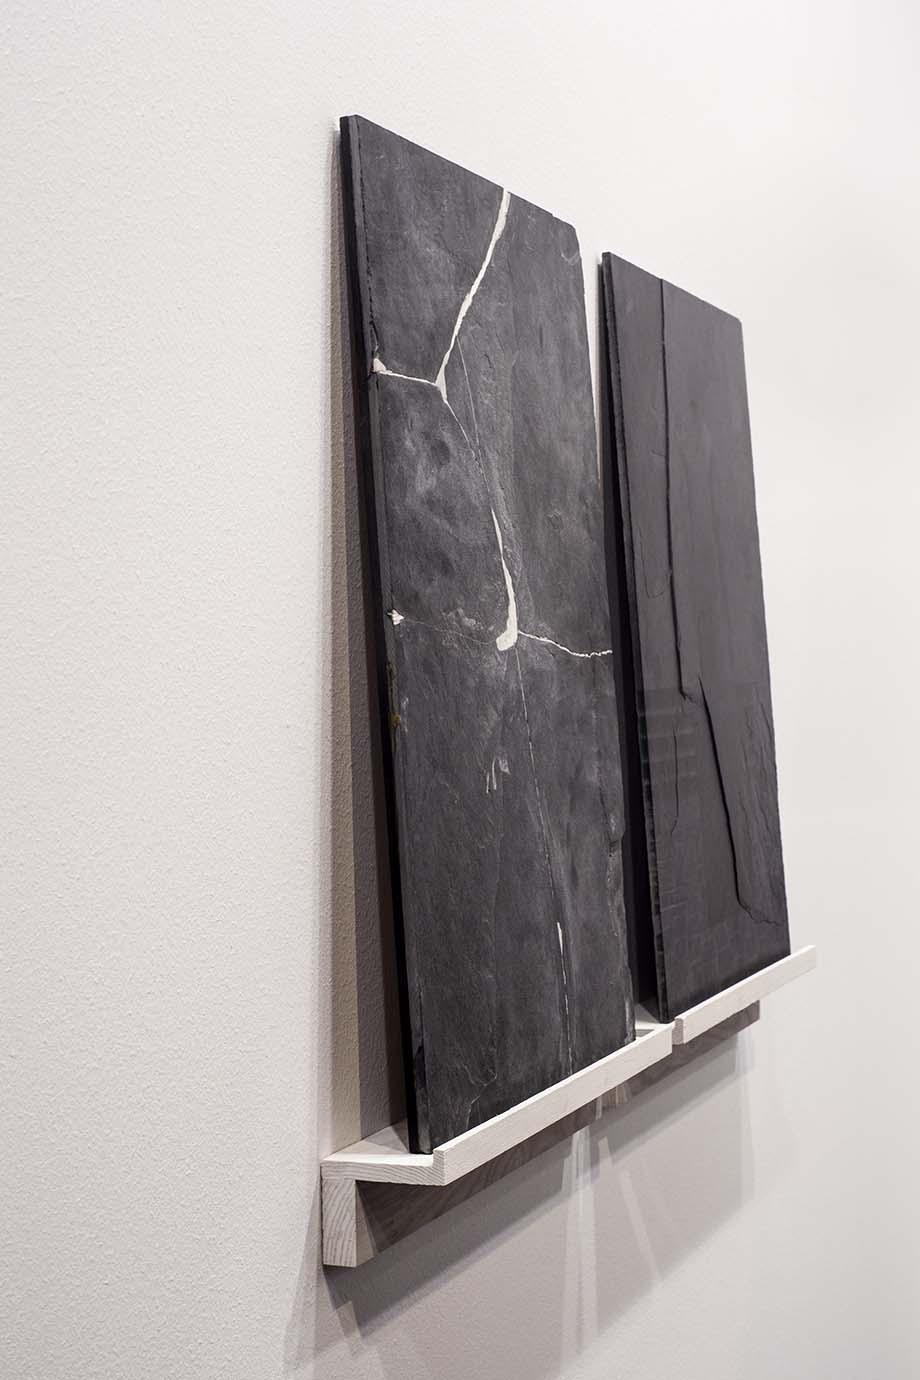 Pablo Rasgado, Arco, Arco Madrid, Steve Turner, Los Angeles, Mexico City, contemporary art